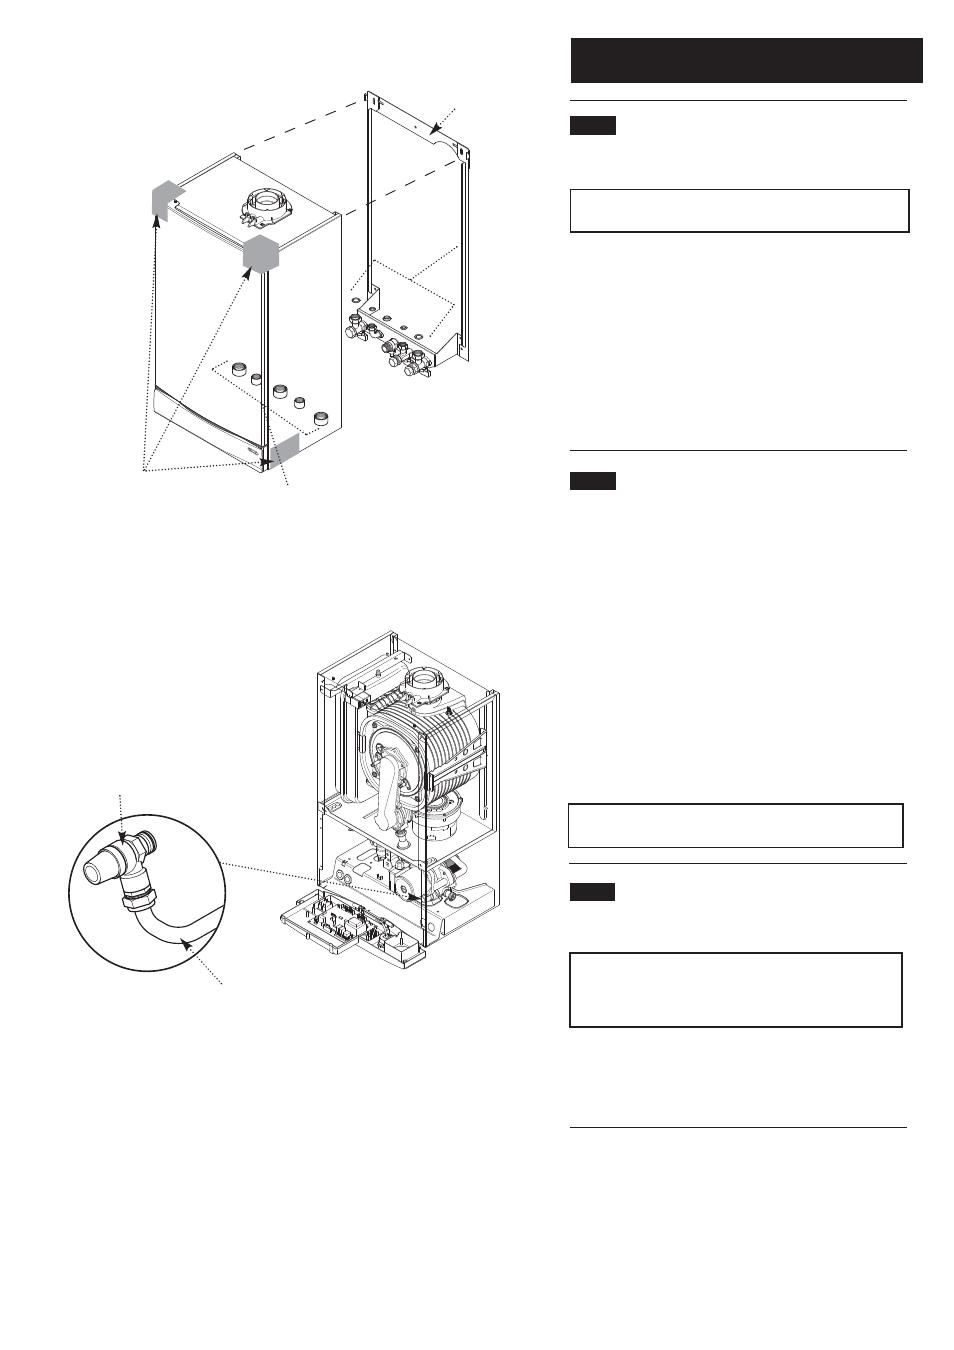 0 installation baxi potterton heatmax combi he condensing 0 installation baxi potterton heatmax combi he condensing combination boiler user manual page 30 asfbconference2016 Images